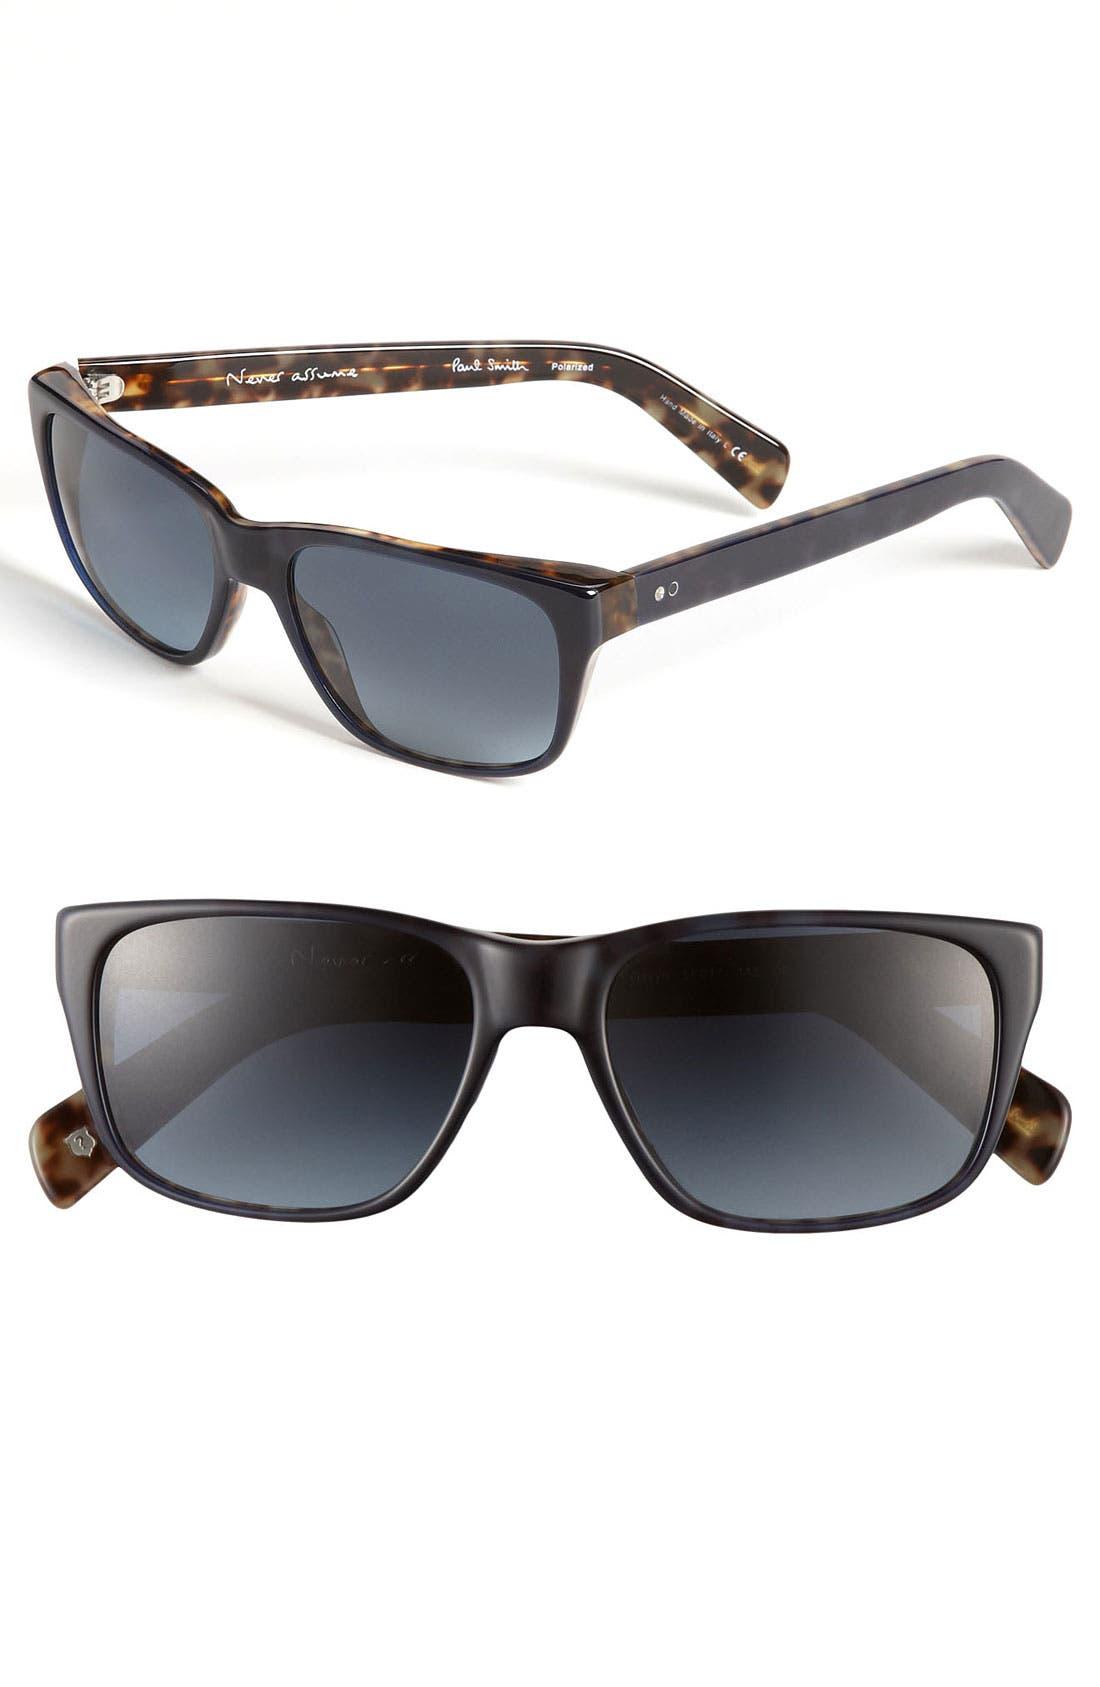 Alternate Image 1 Selected - Paul Smith 'Gavyn' Polarized Gradient Sunglasses